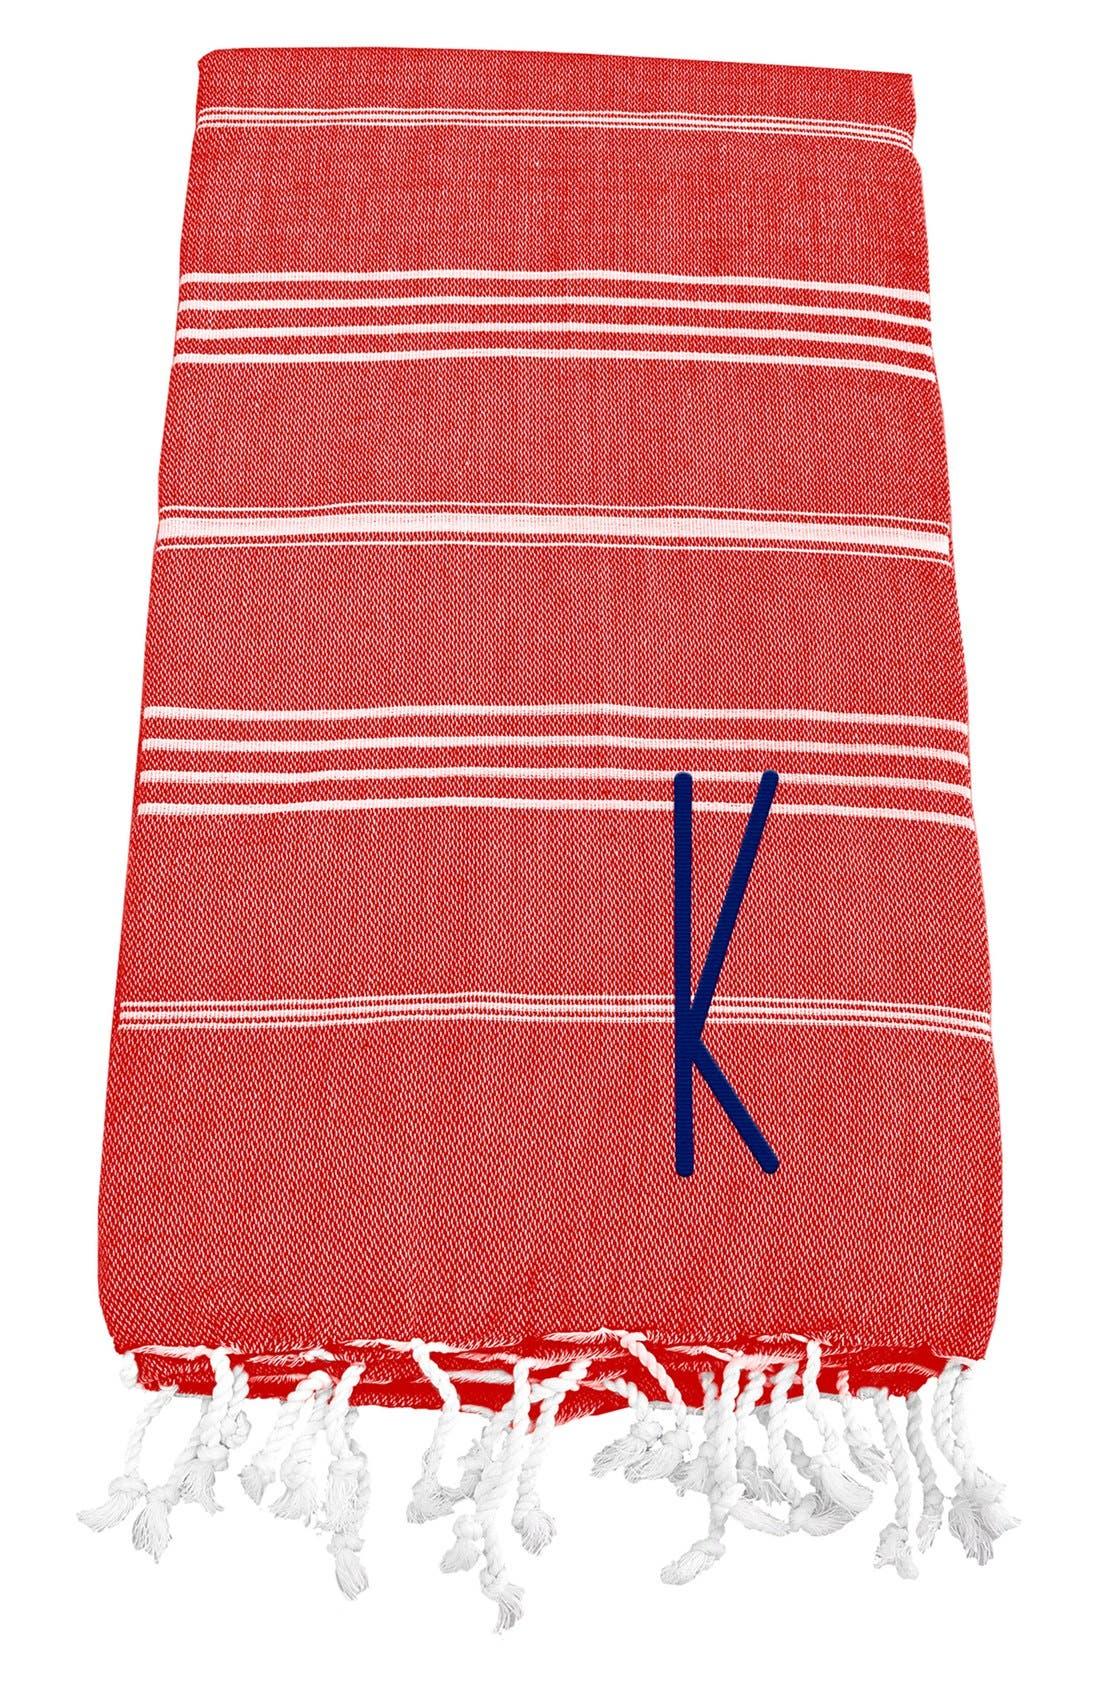 Monogram Turkish Cotton Towel,                             Main thumbnail 120, color,